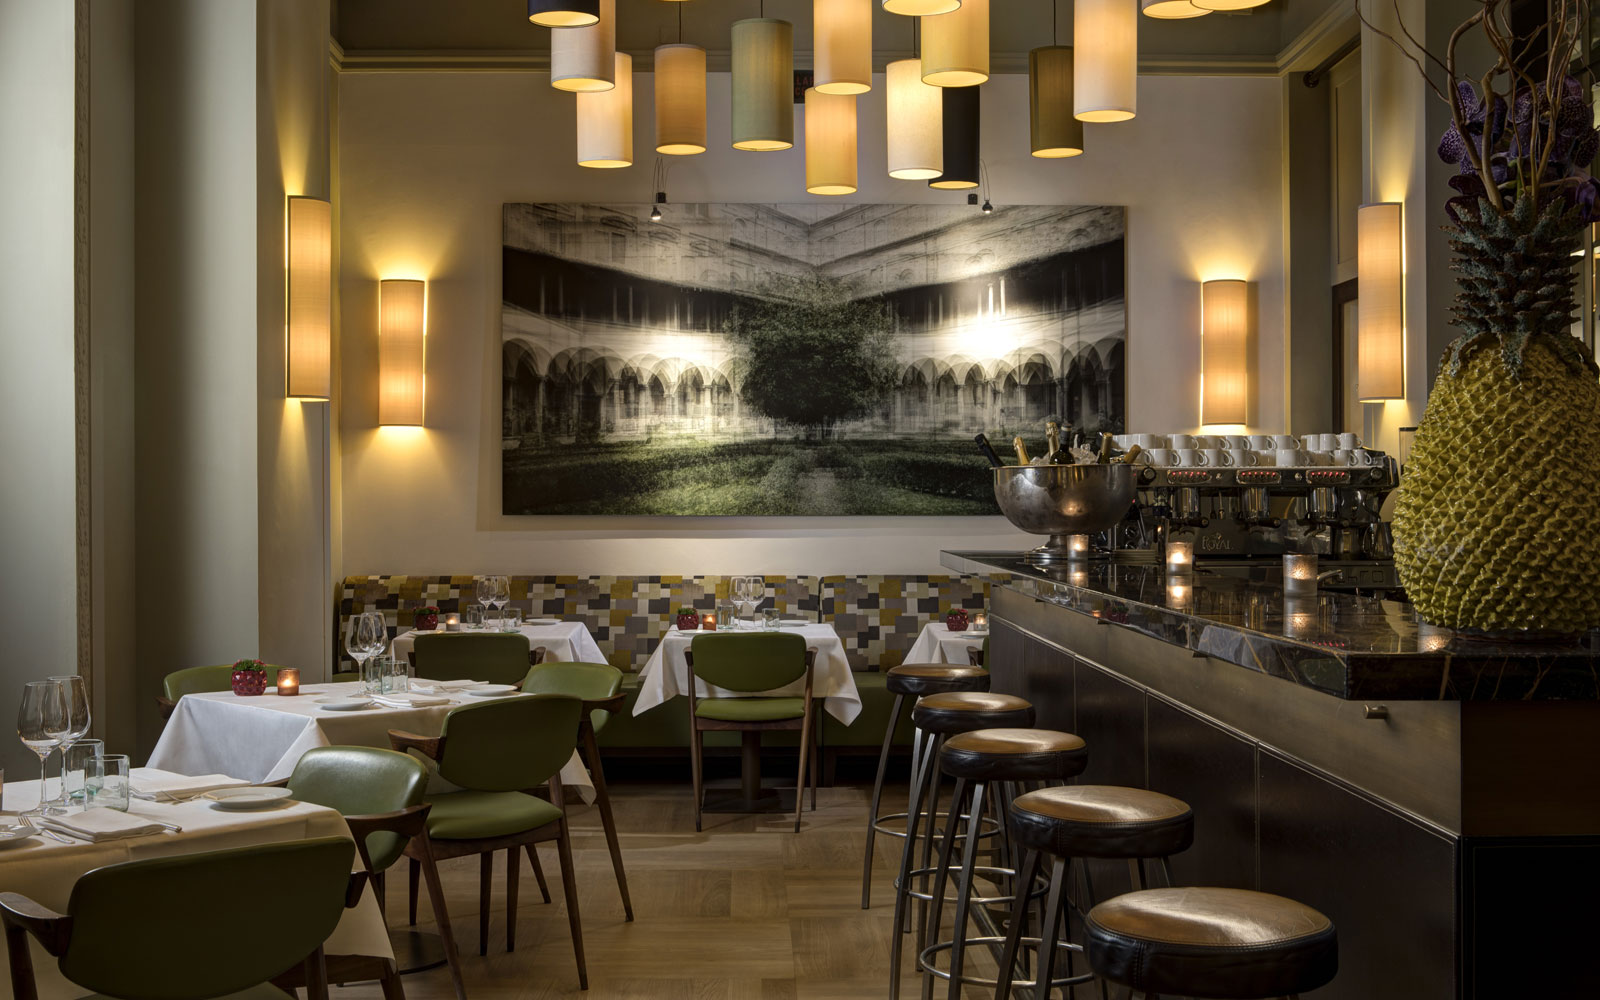 Hotel Savoy  Dining